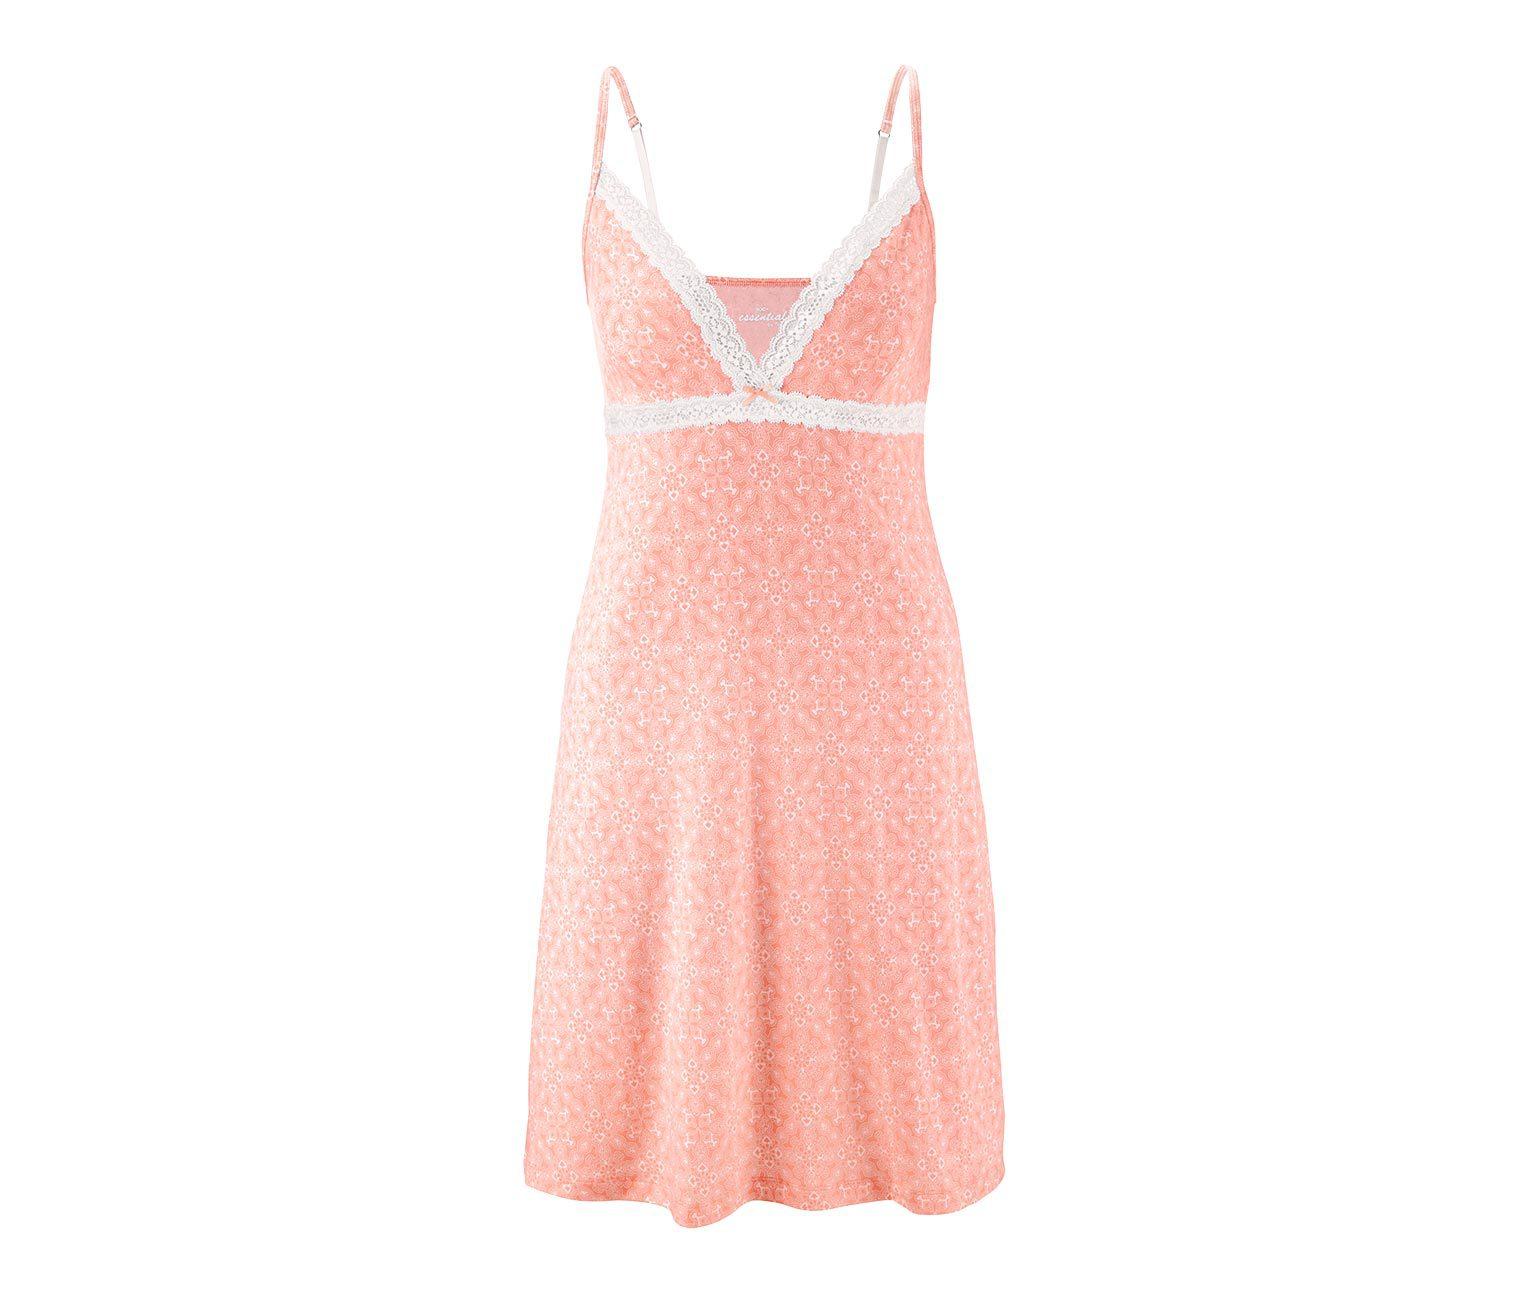 Plus-size Summer Modal Cotton Condole   Nightgown   Sleeveless Women Sleepwear Sexy Night Gown Lace   Sleepshirts   Women Night Dress